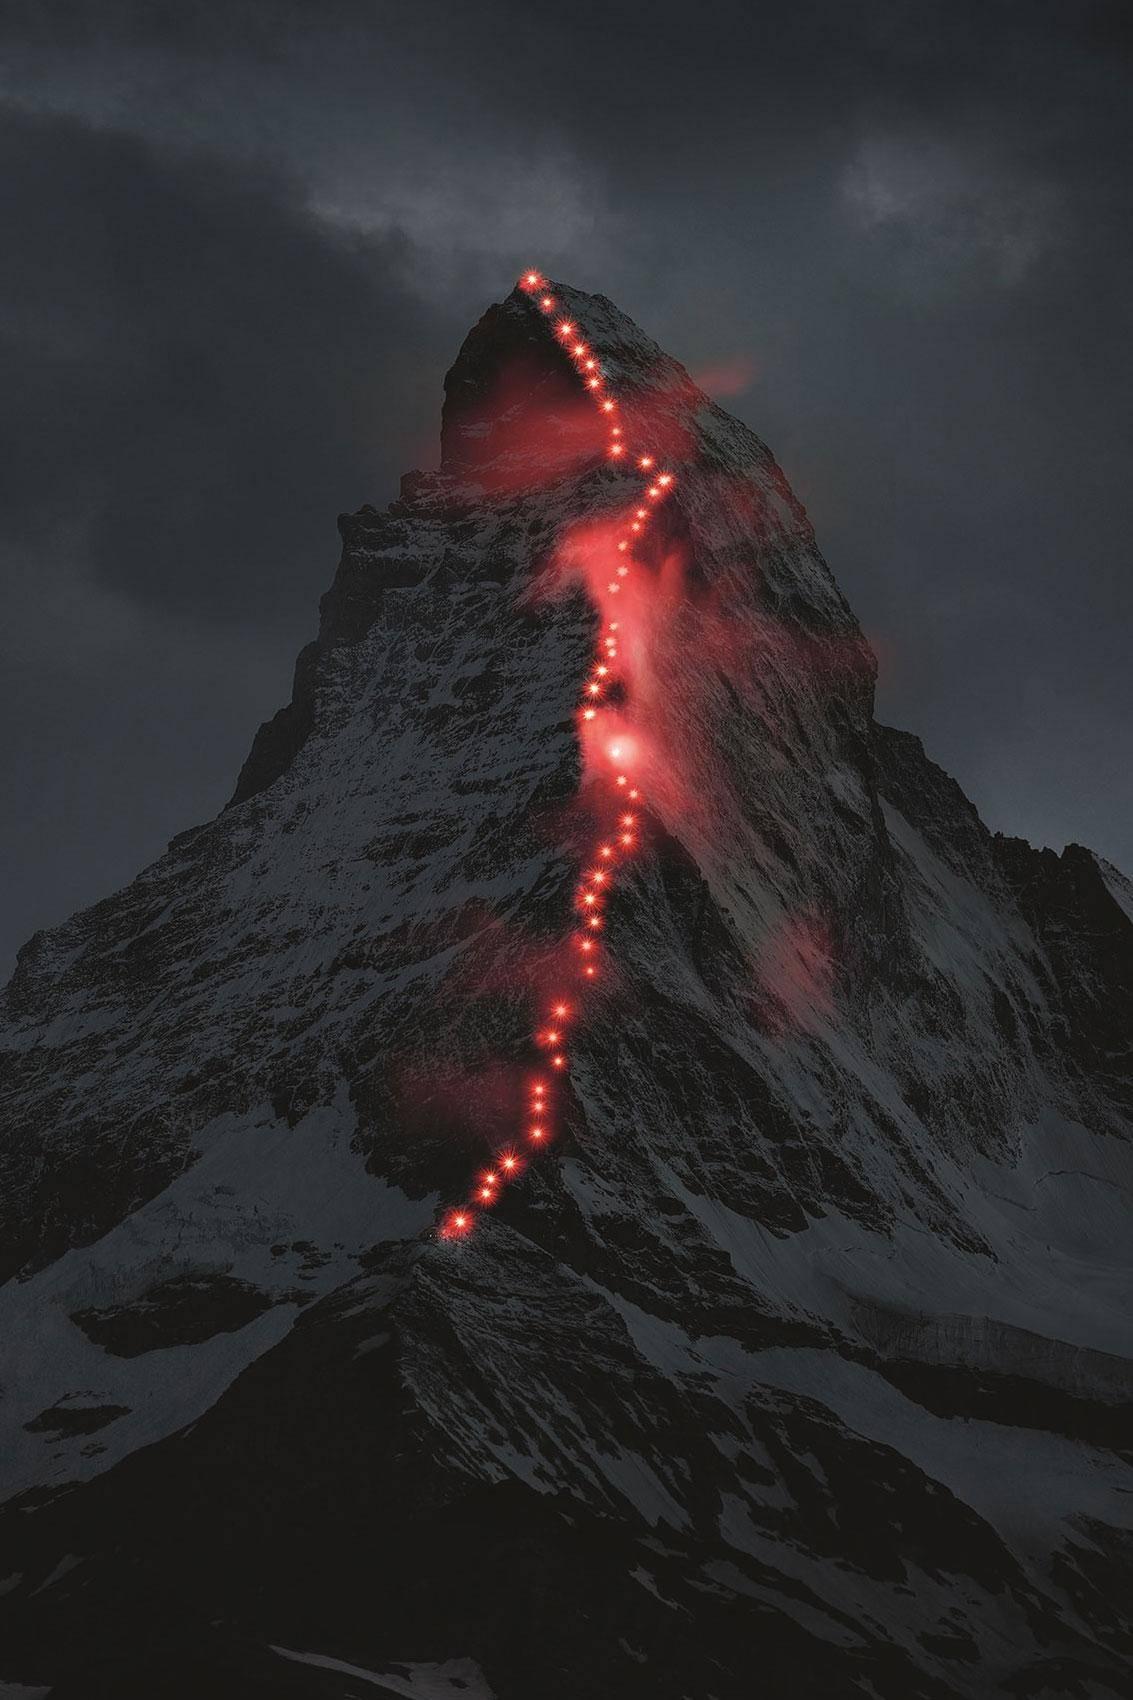 Lampen beleuchten die Route der Erstbesteigung des berühmten Matterhorns in Zermatt, Schweiz